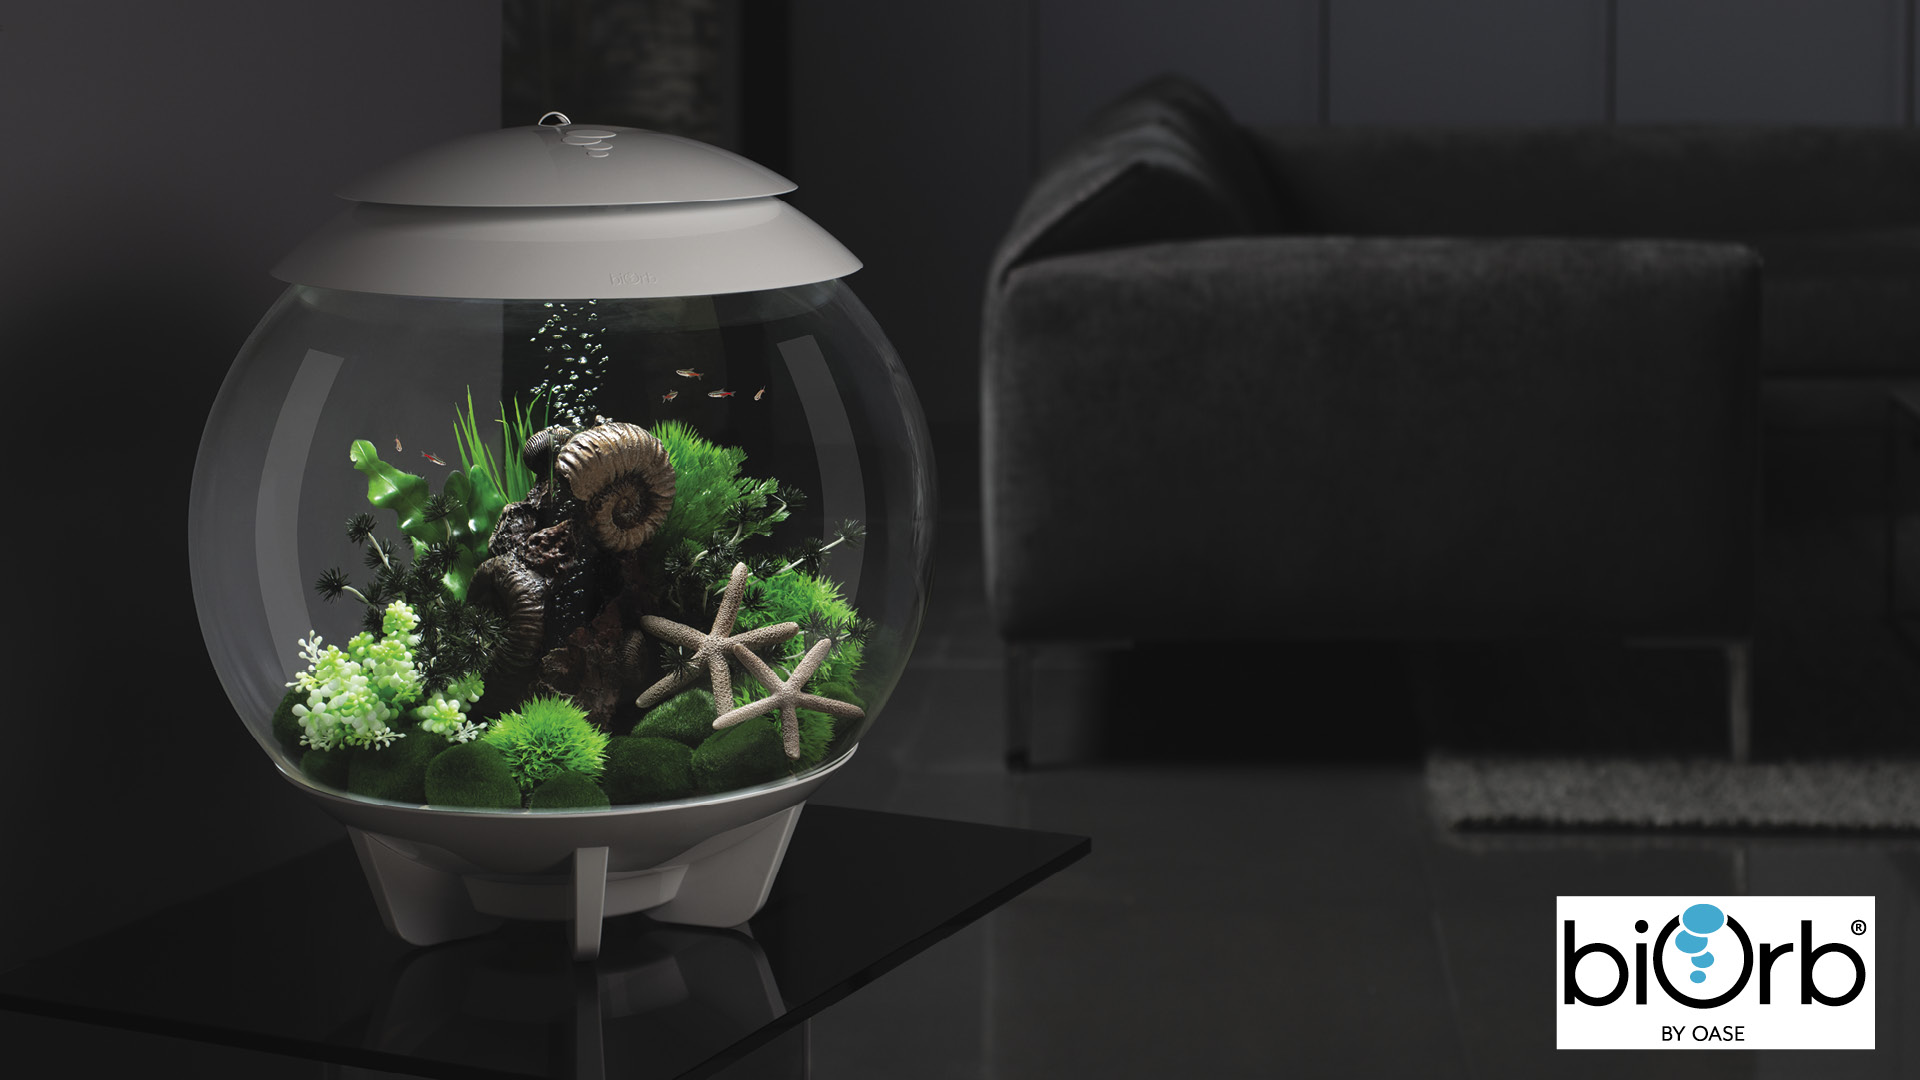 Win a biOrb aquarium Worth £159.99!